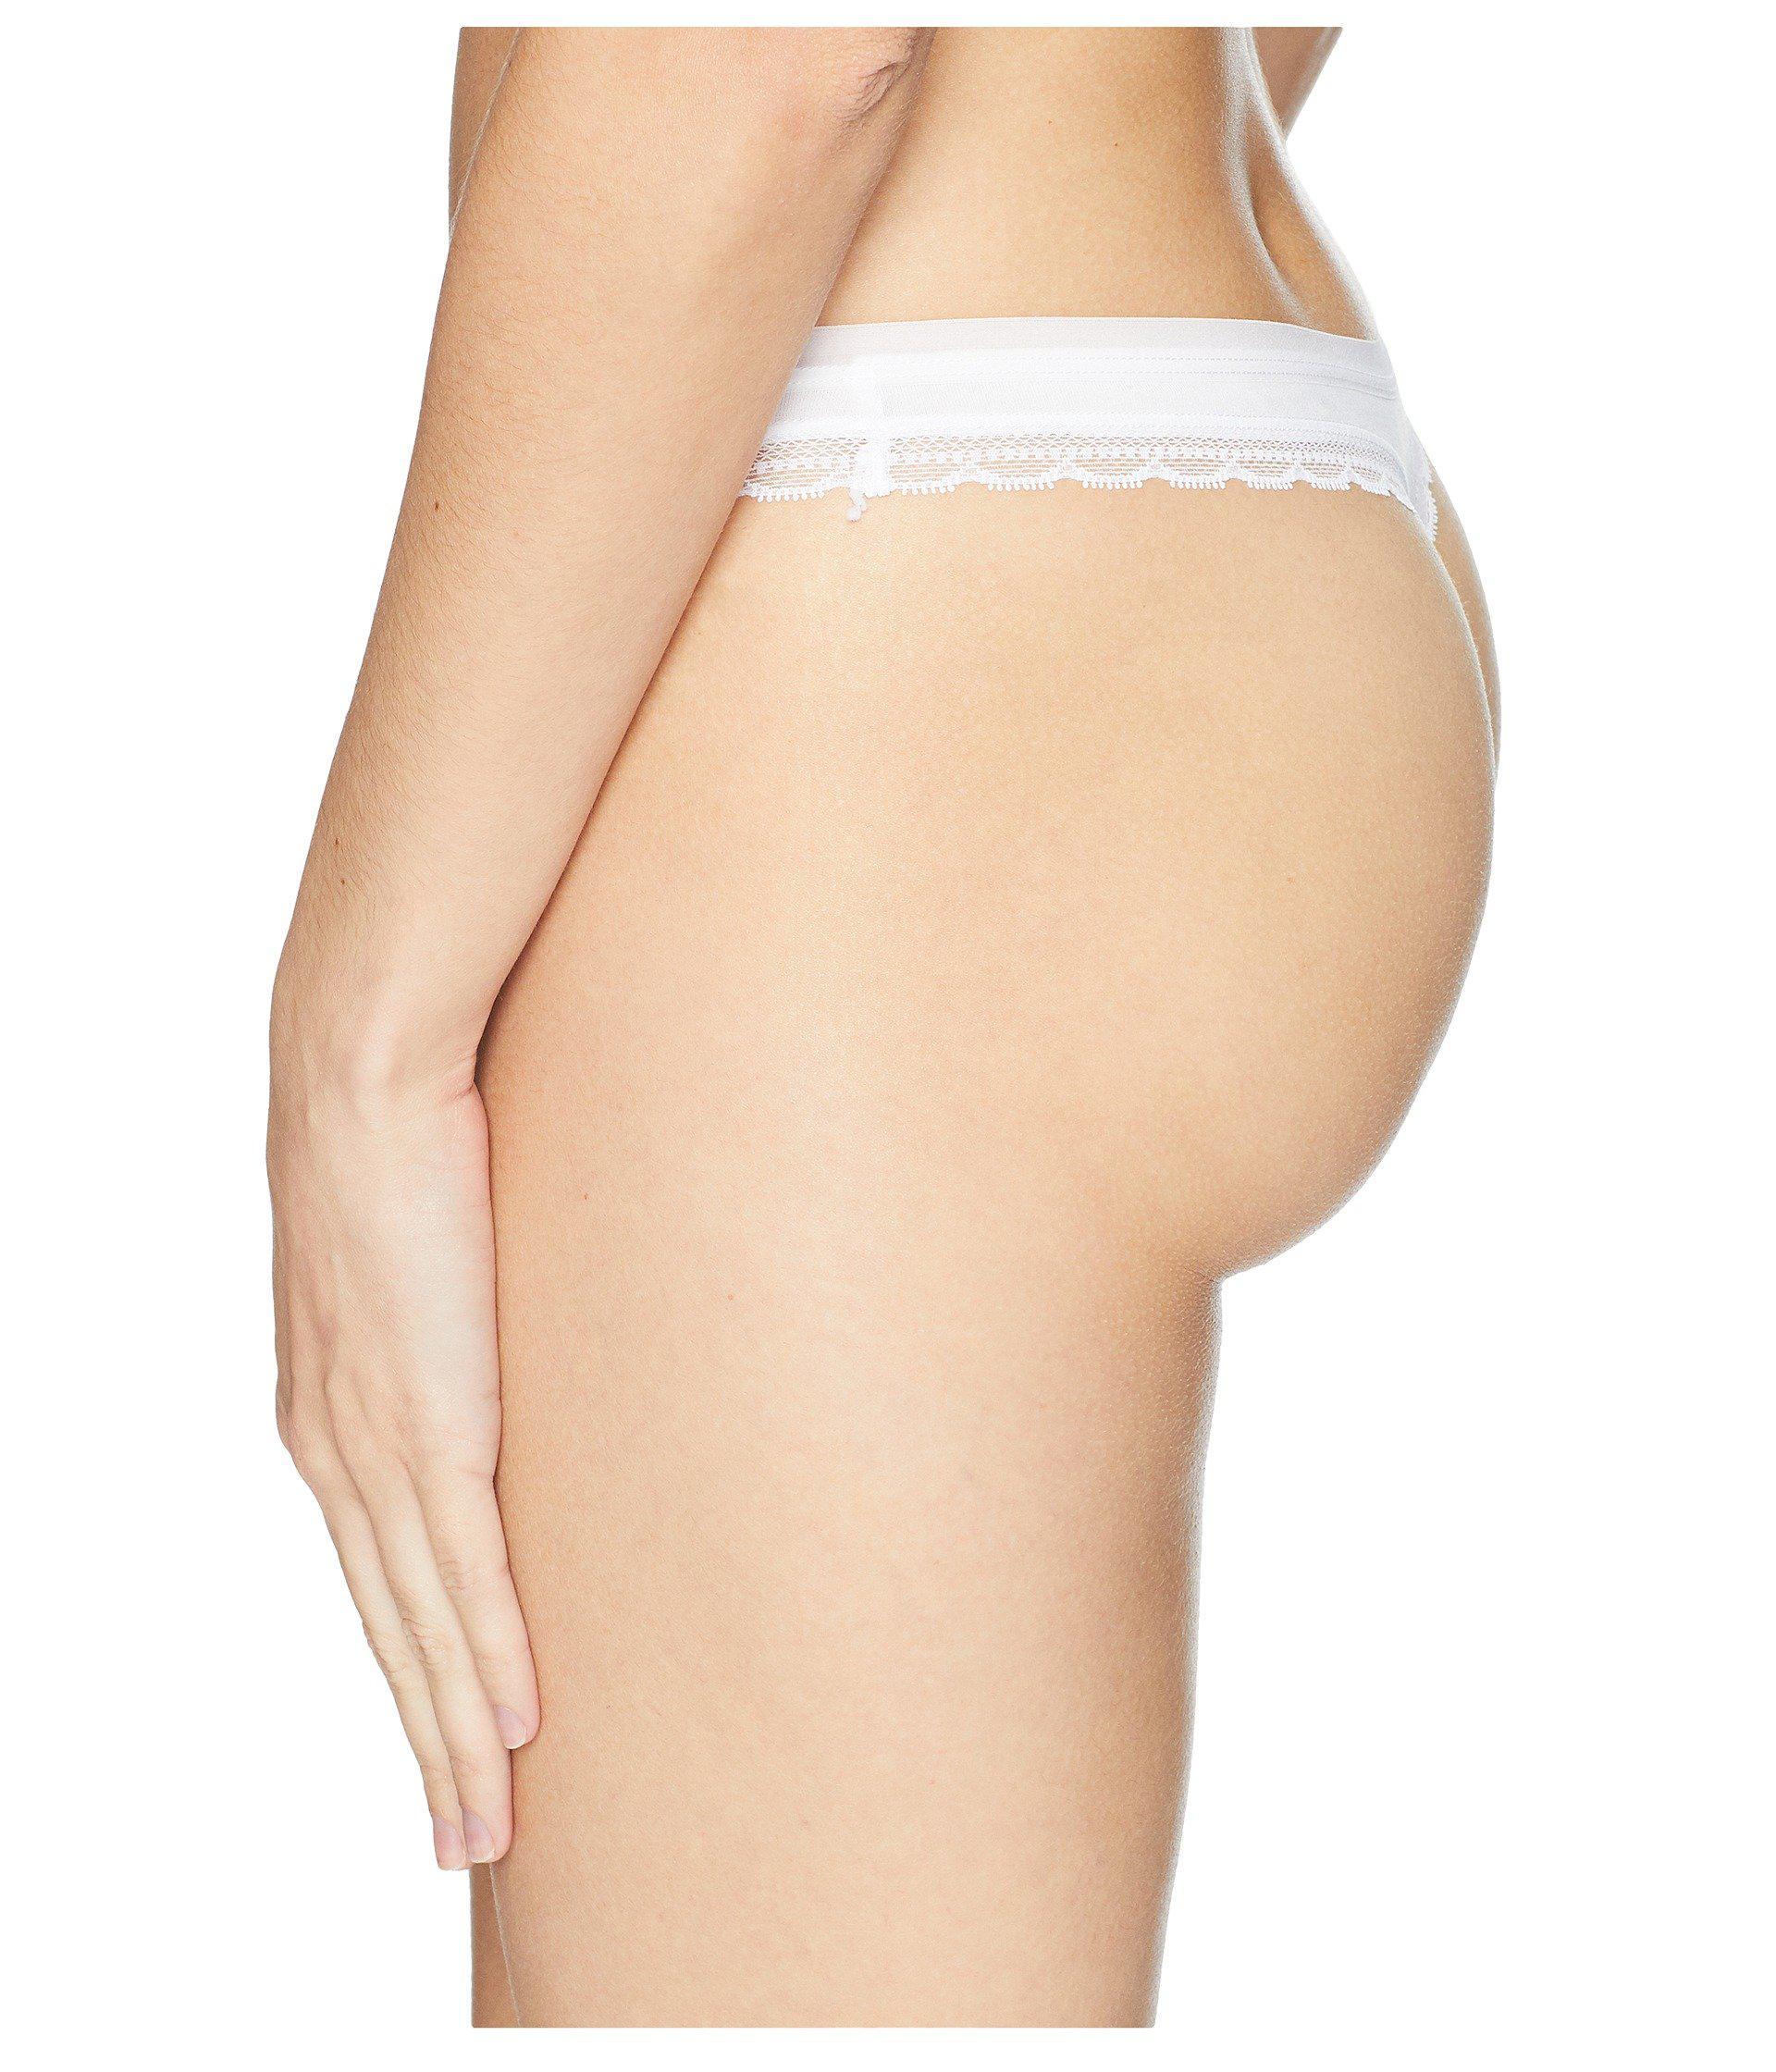 28a5340f0 On Gossamer - White Cabana Cotton Hip G Thong G2161 (heather Grey) Women s  Underwear. View fullscreen